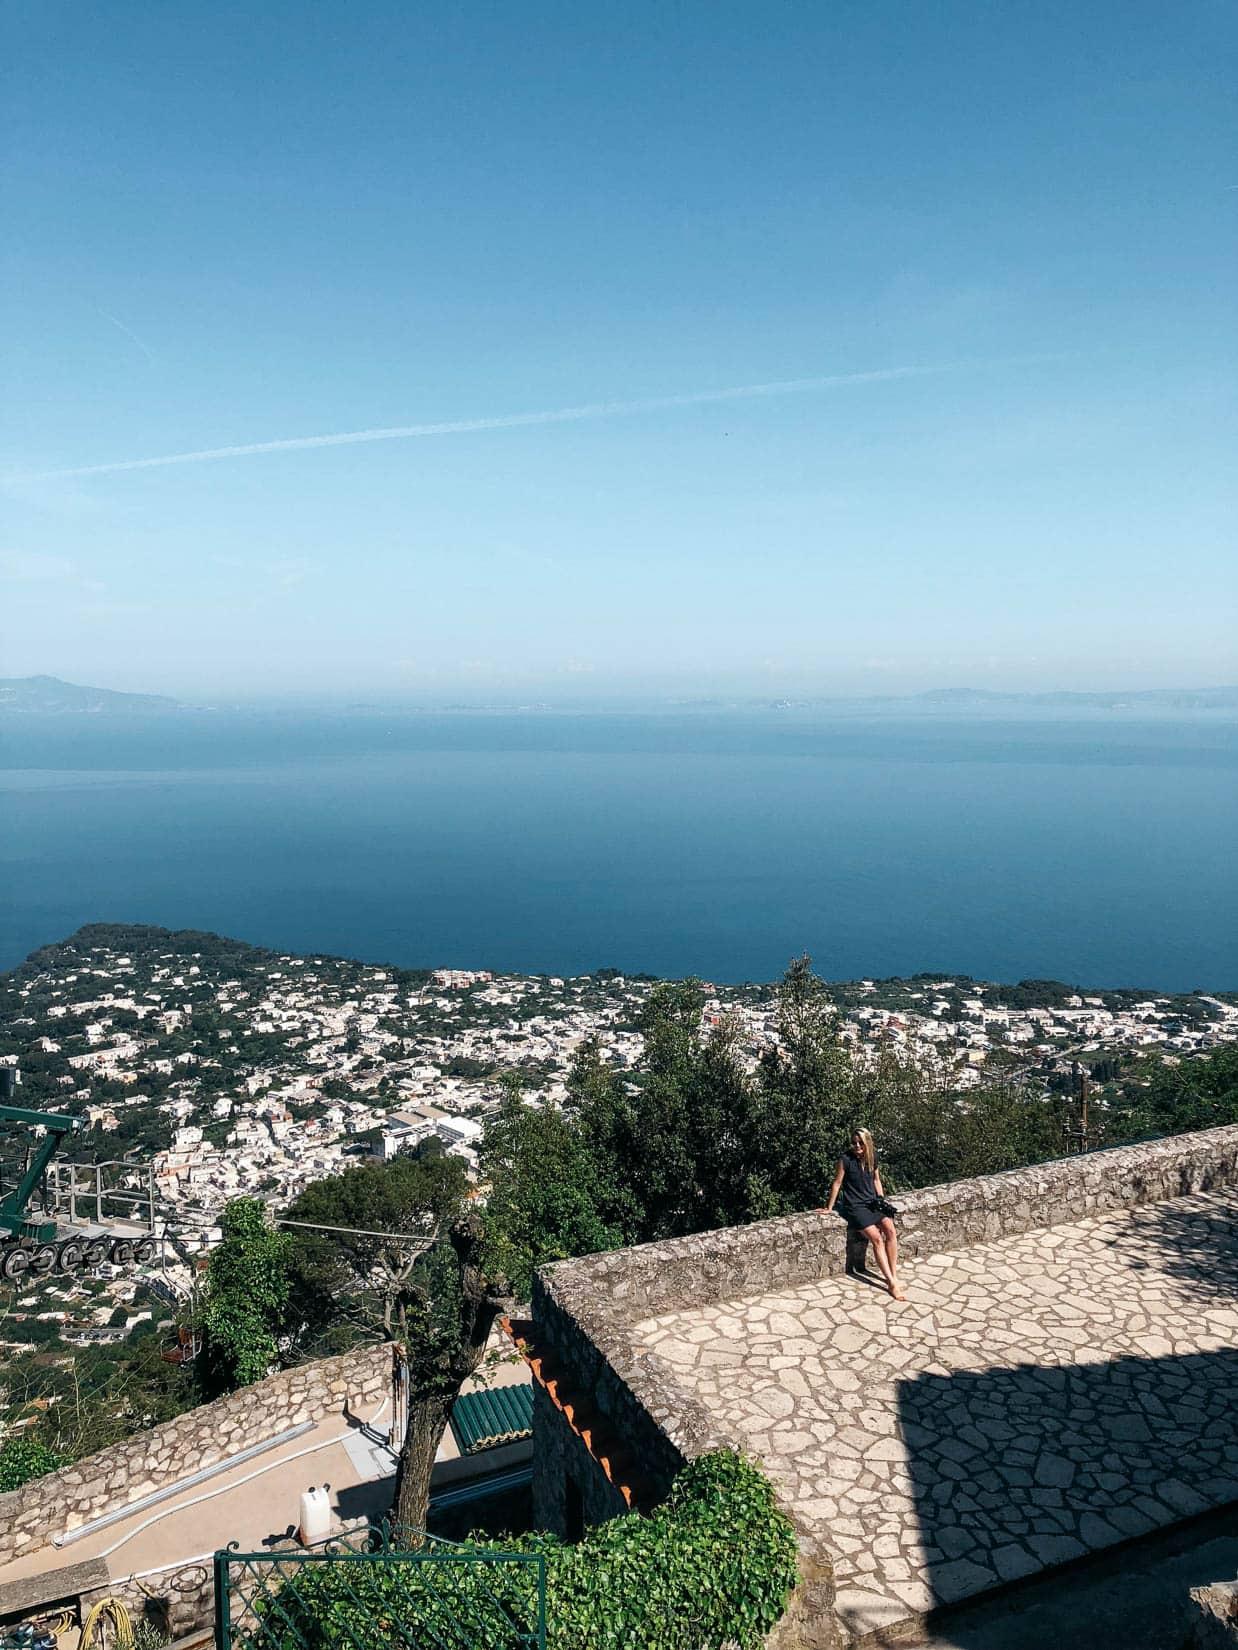 Best Views of Capri